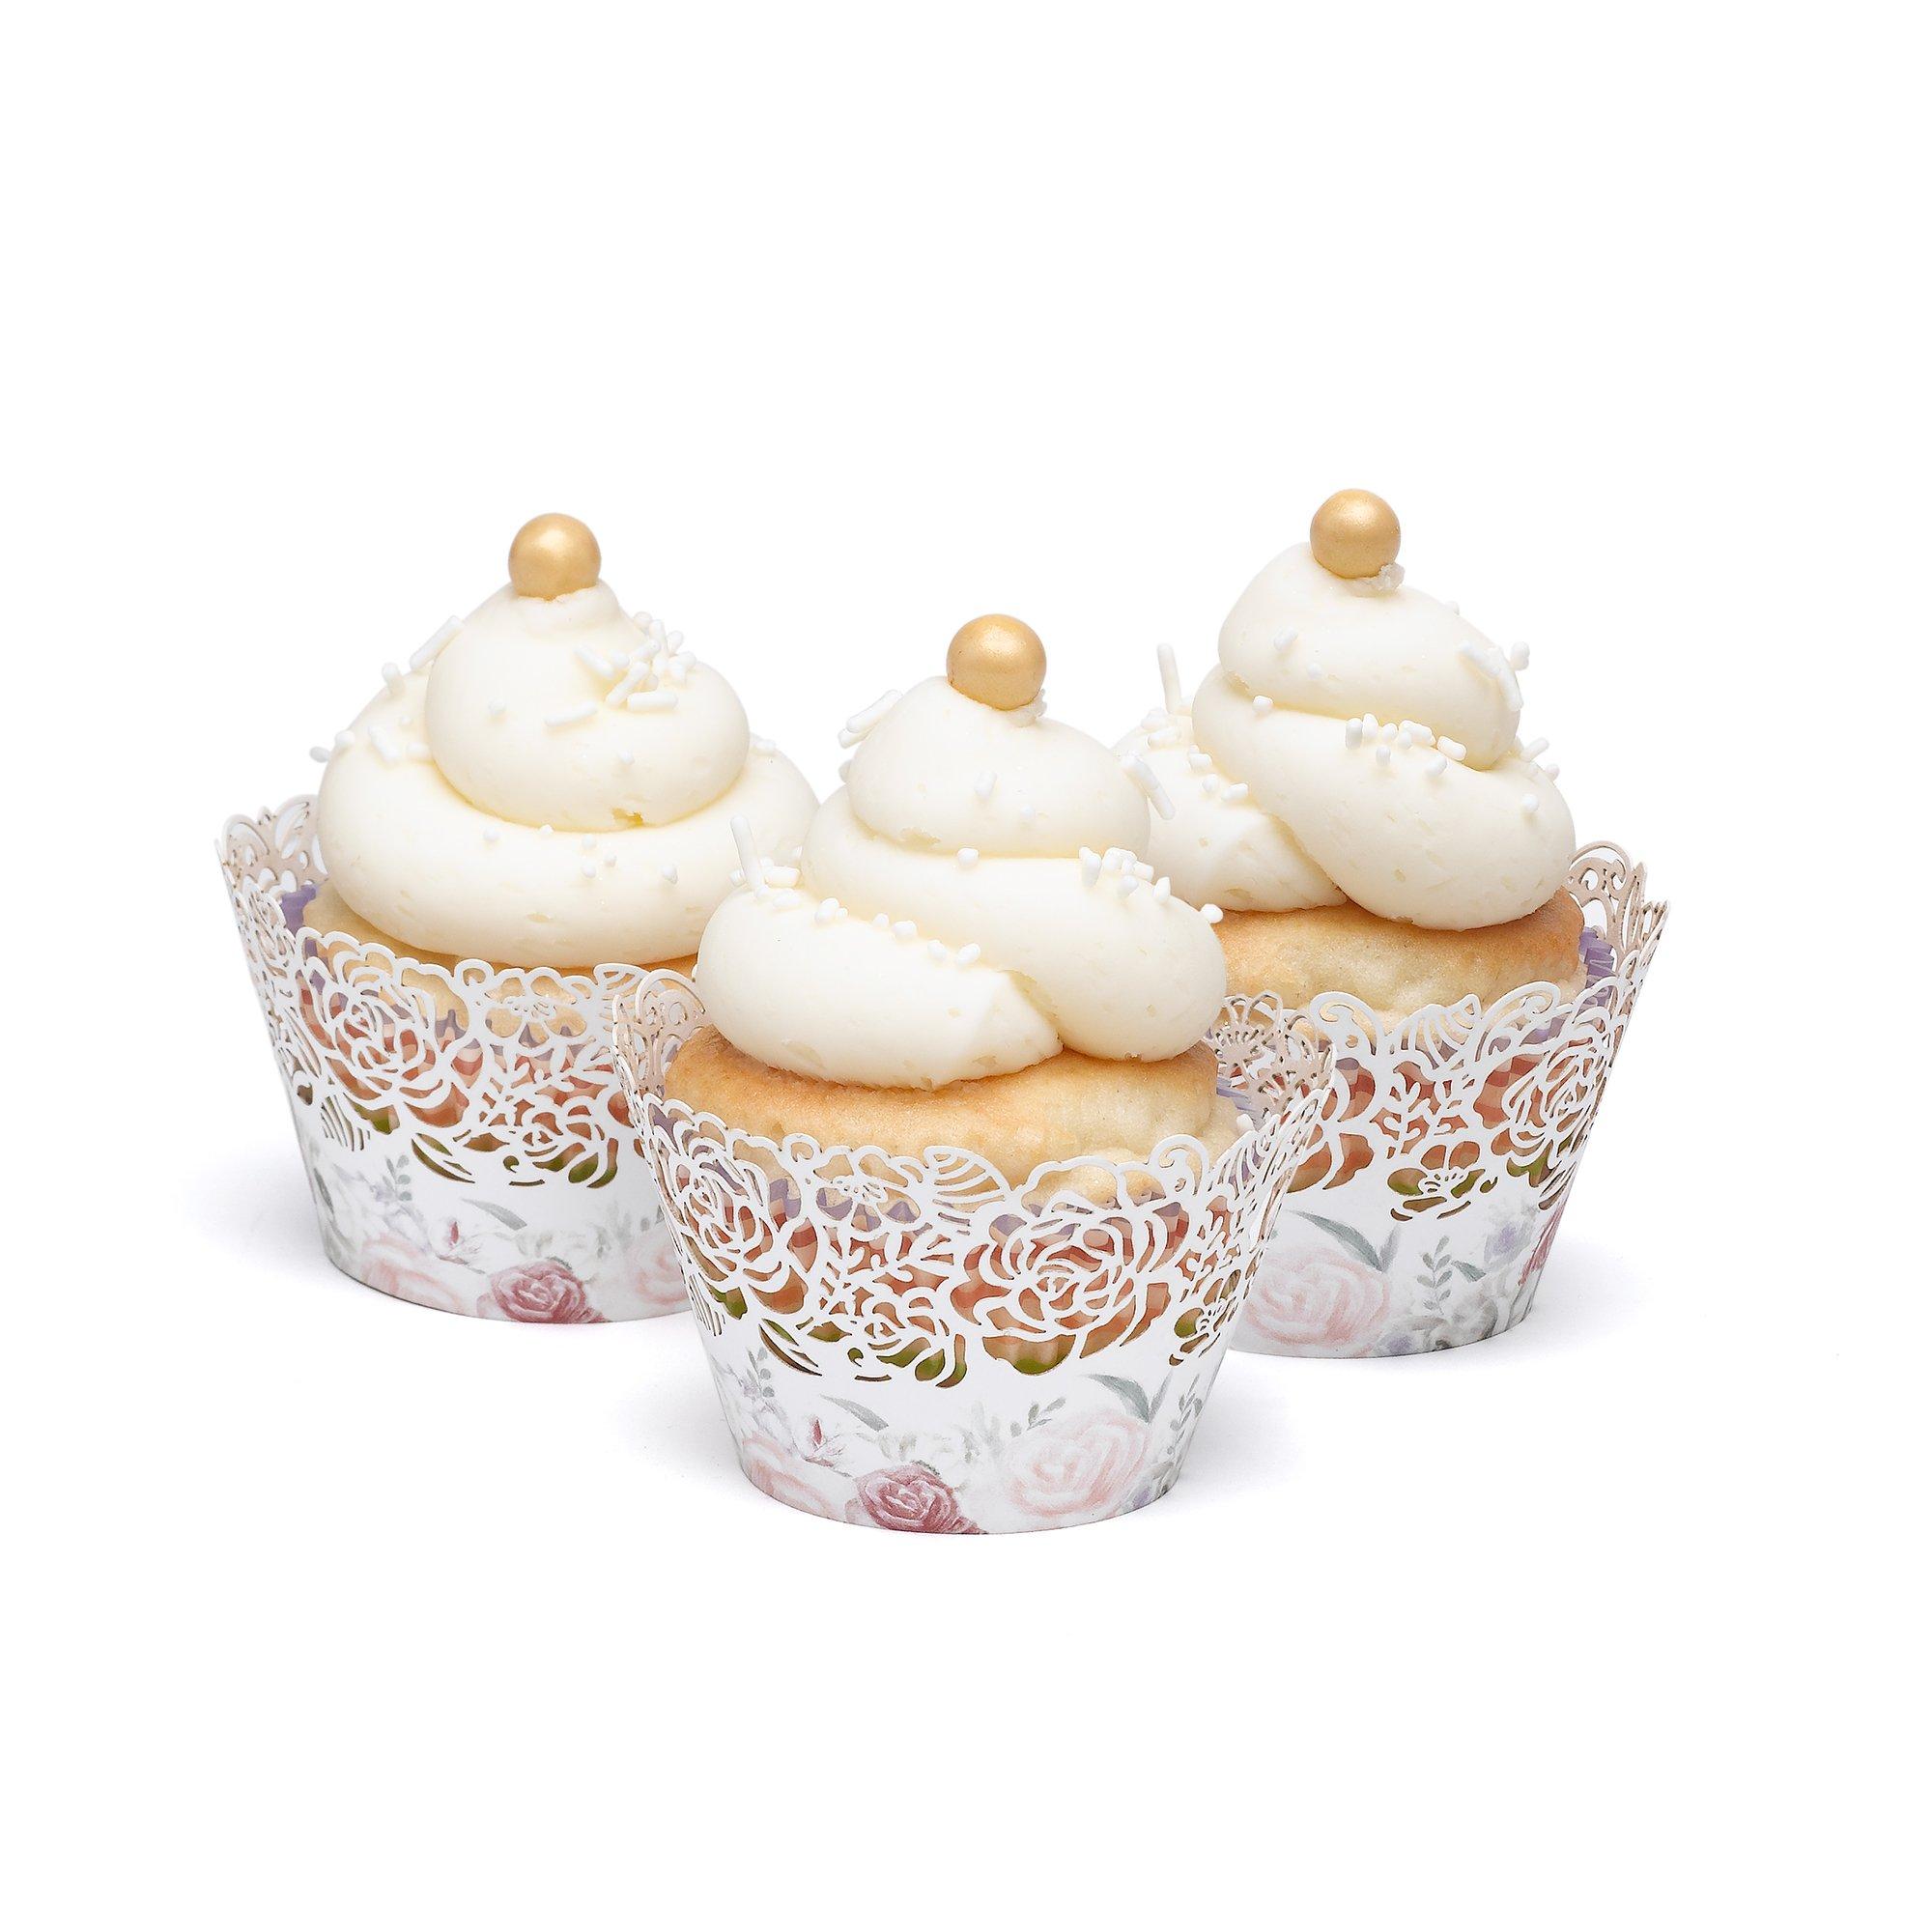 Hortense B. Hewitt 55542 Cupcake Wraps, Ethereal Floral